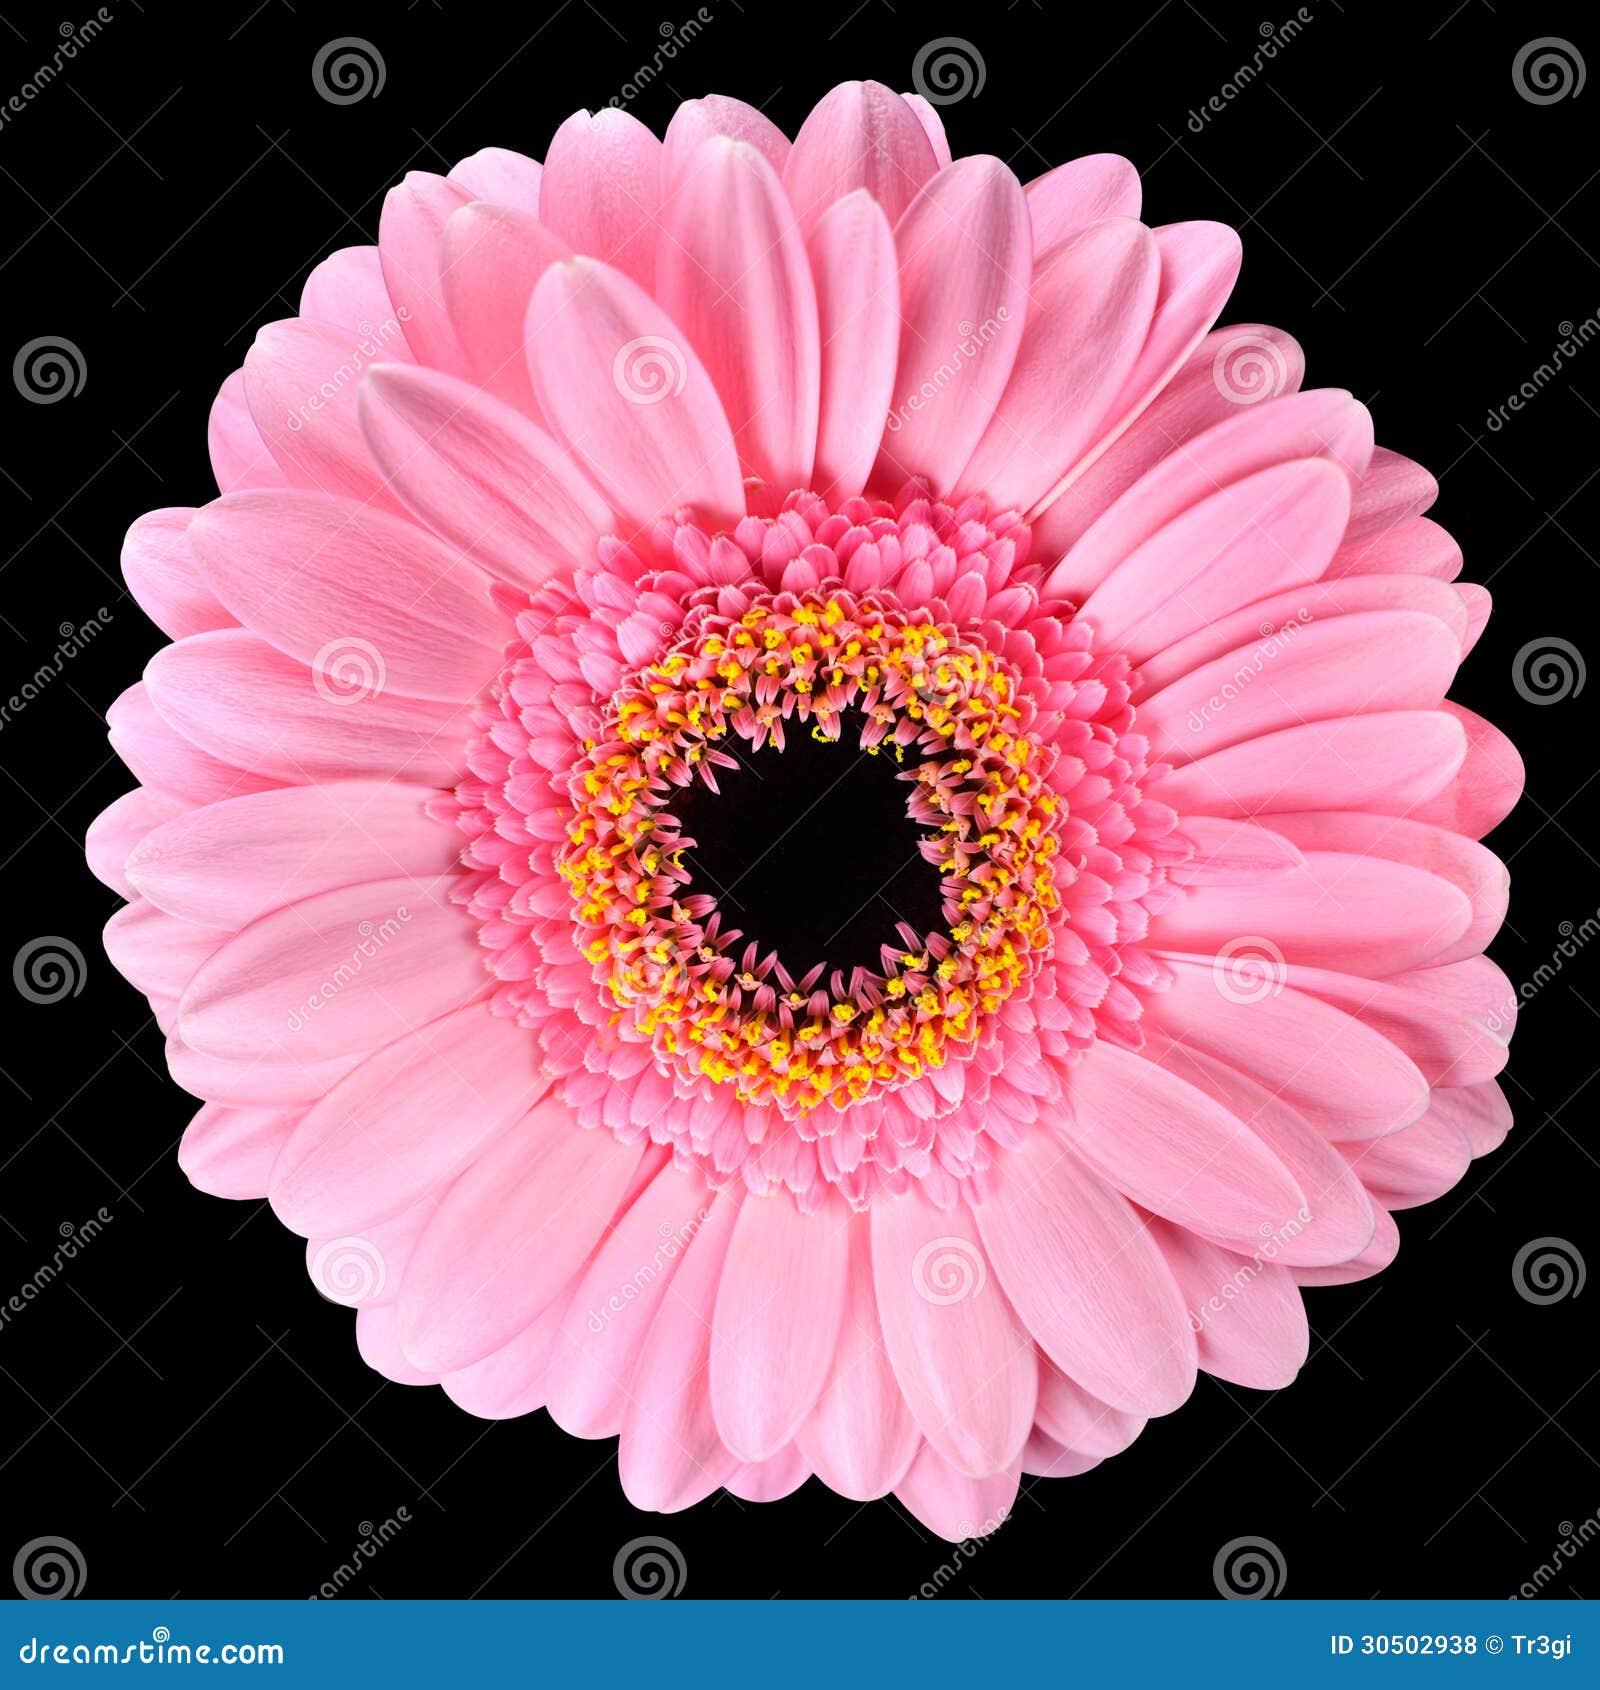 Pink Gerbera Marigold Flower Isolated On Black Stock Photo Image